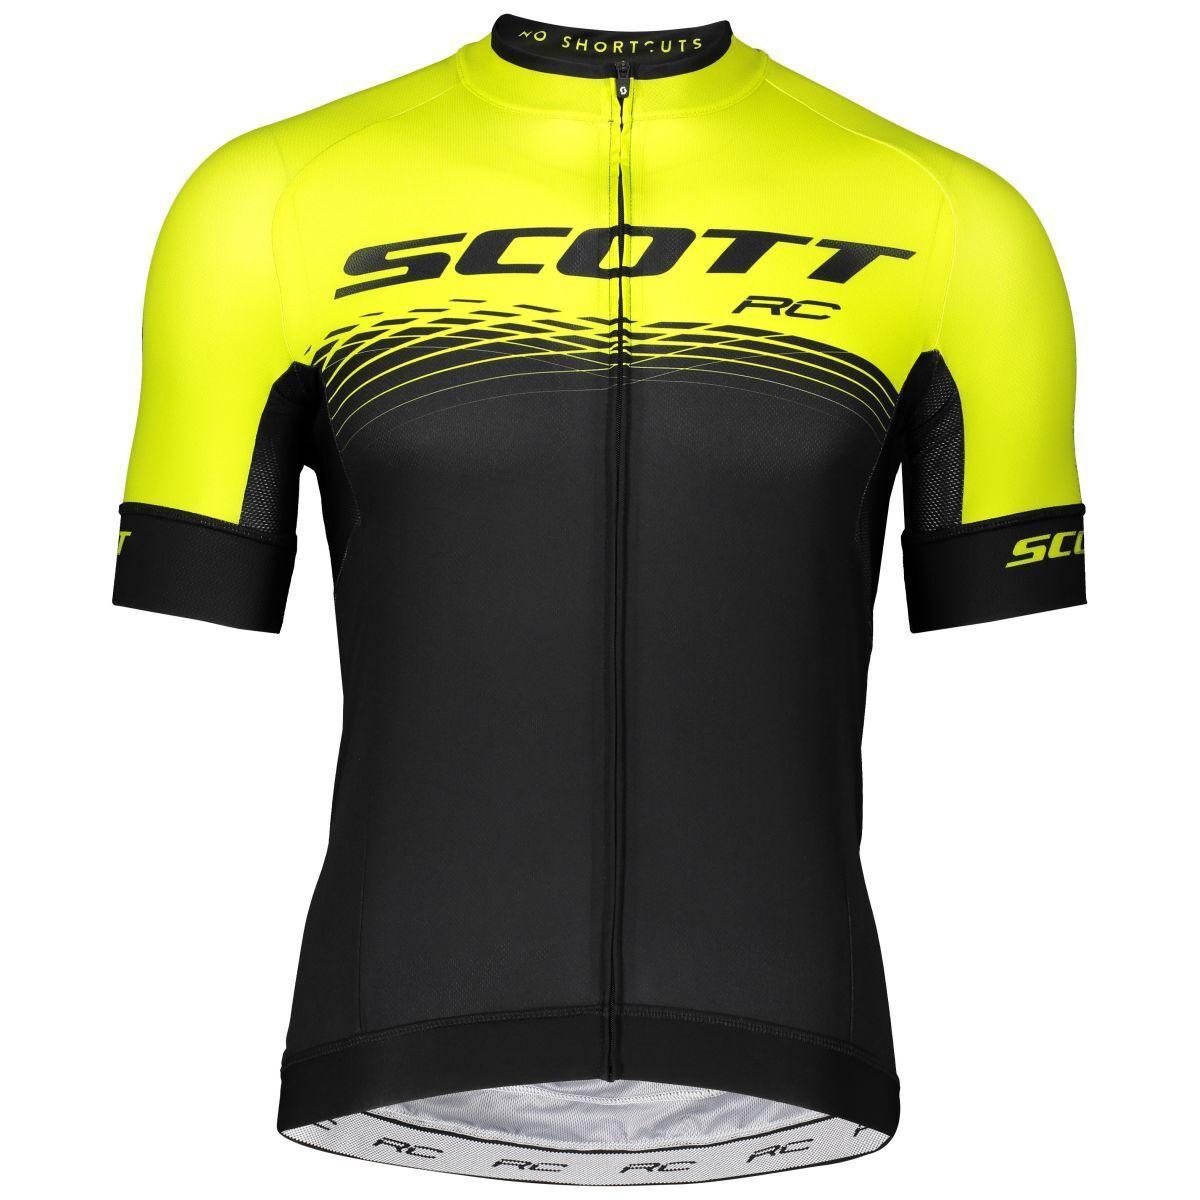 Scott RC Pro Fahrrad Trikot kurz schwarz gelb 2019